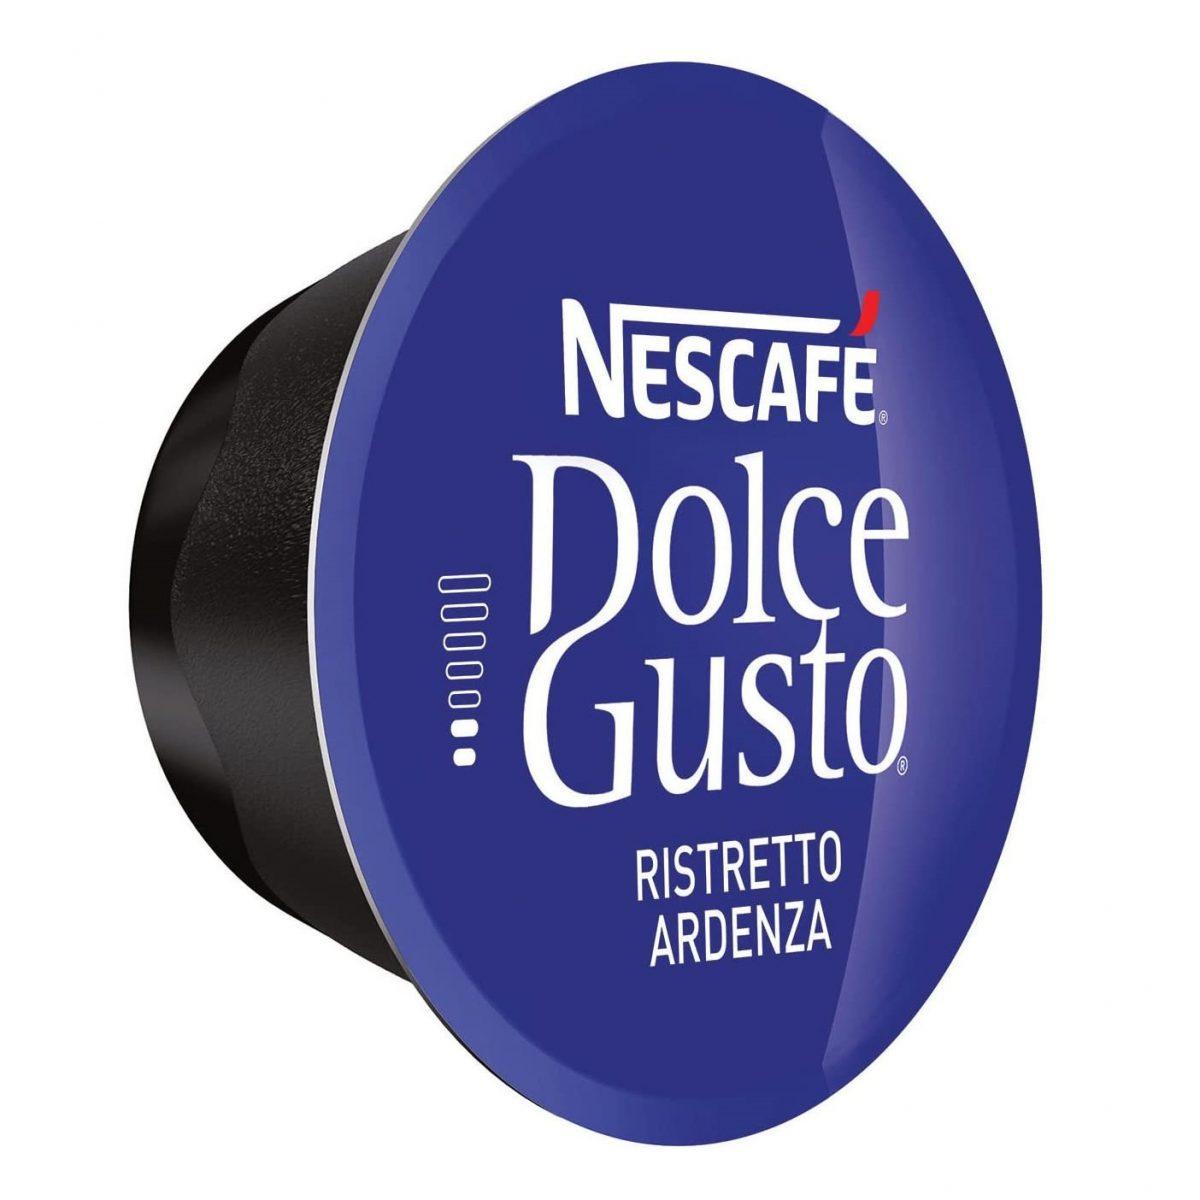 کپسول قهوه دولچه گوستو مدل ریسترتو آردنزا RISTRETTO ARDENZA